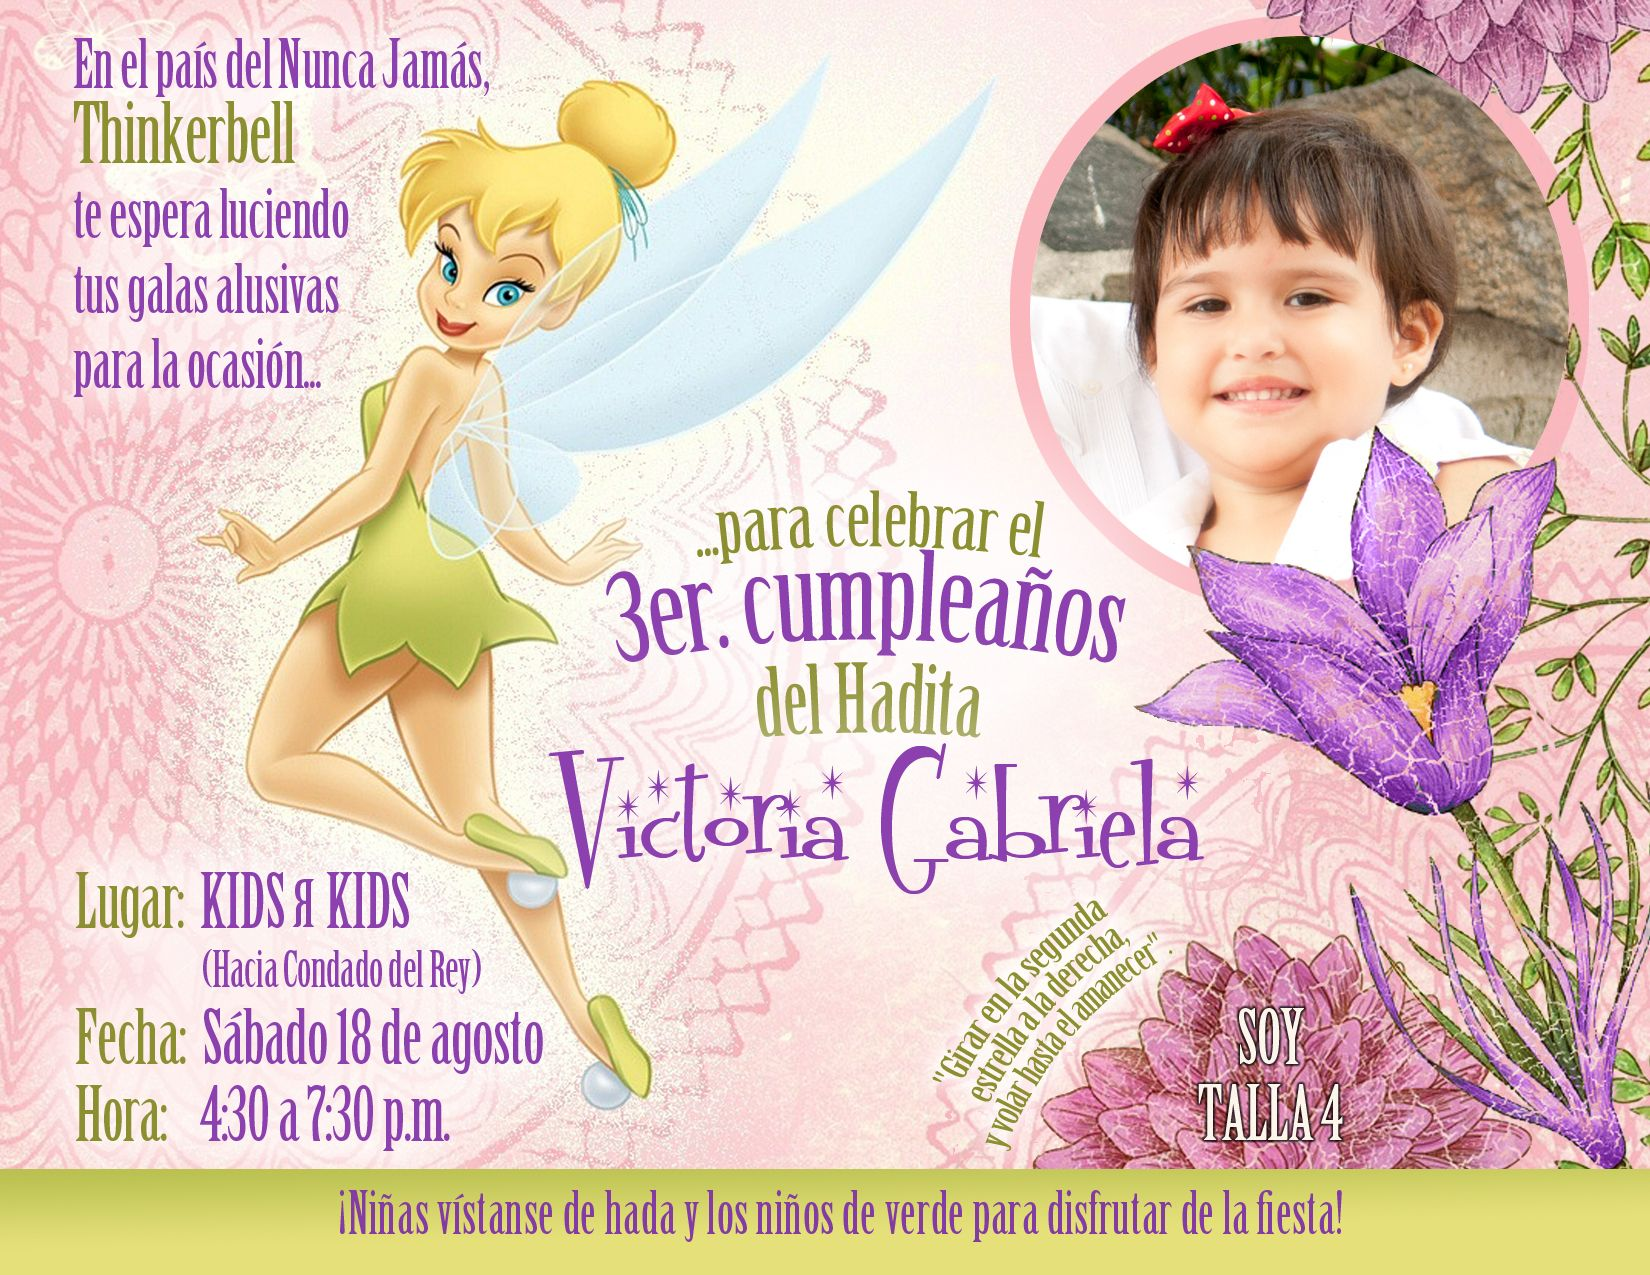 Tarjeta Invitacion Cumpleaños Hadas Tarjetas Invitacion